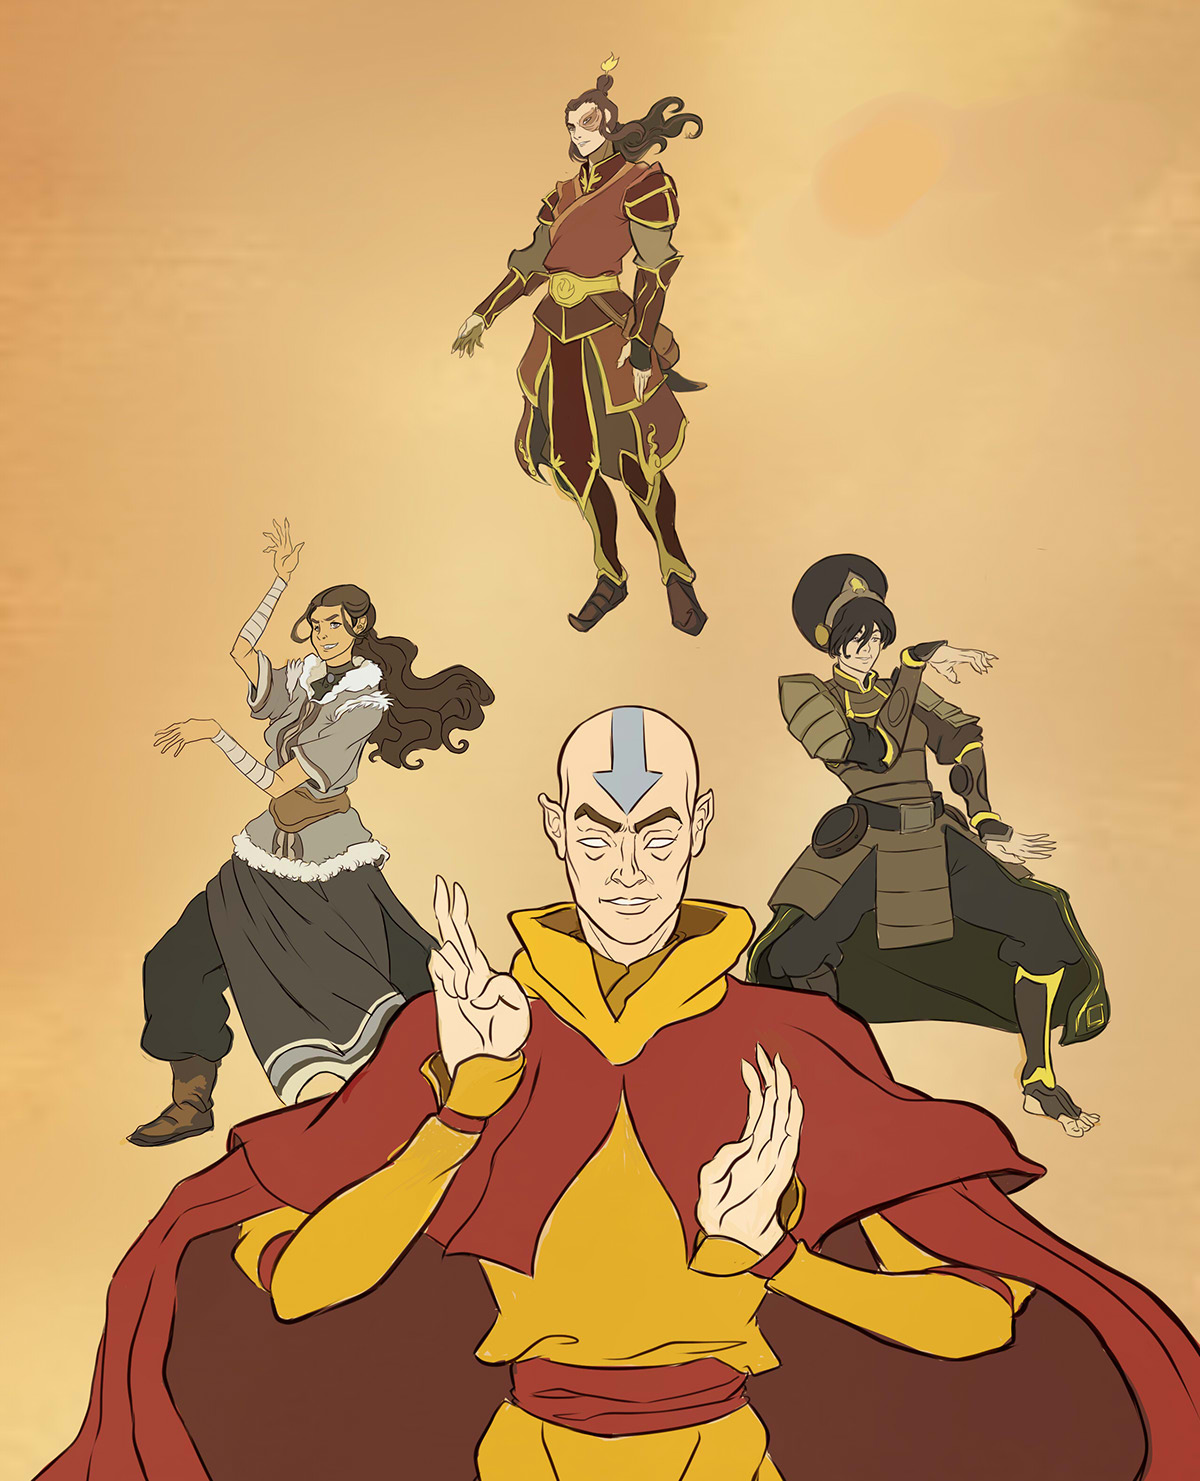 Avatar Art: THE LAST AIRBENDER. Fan Art Comission. On Behance